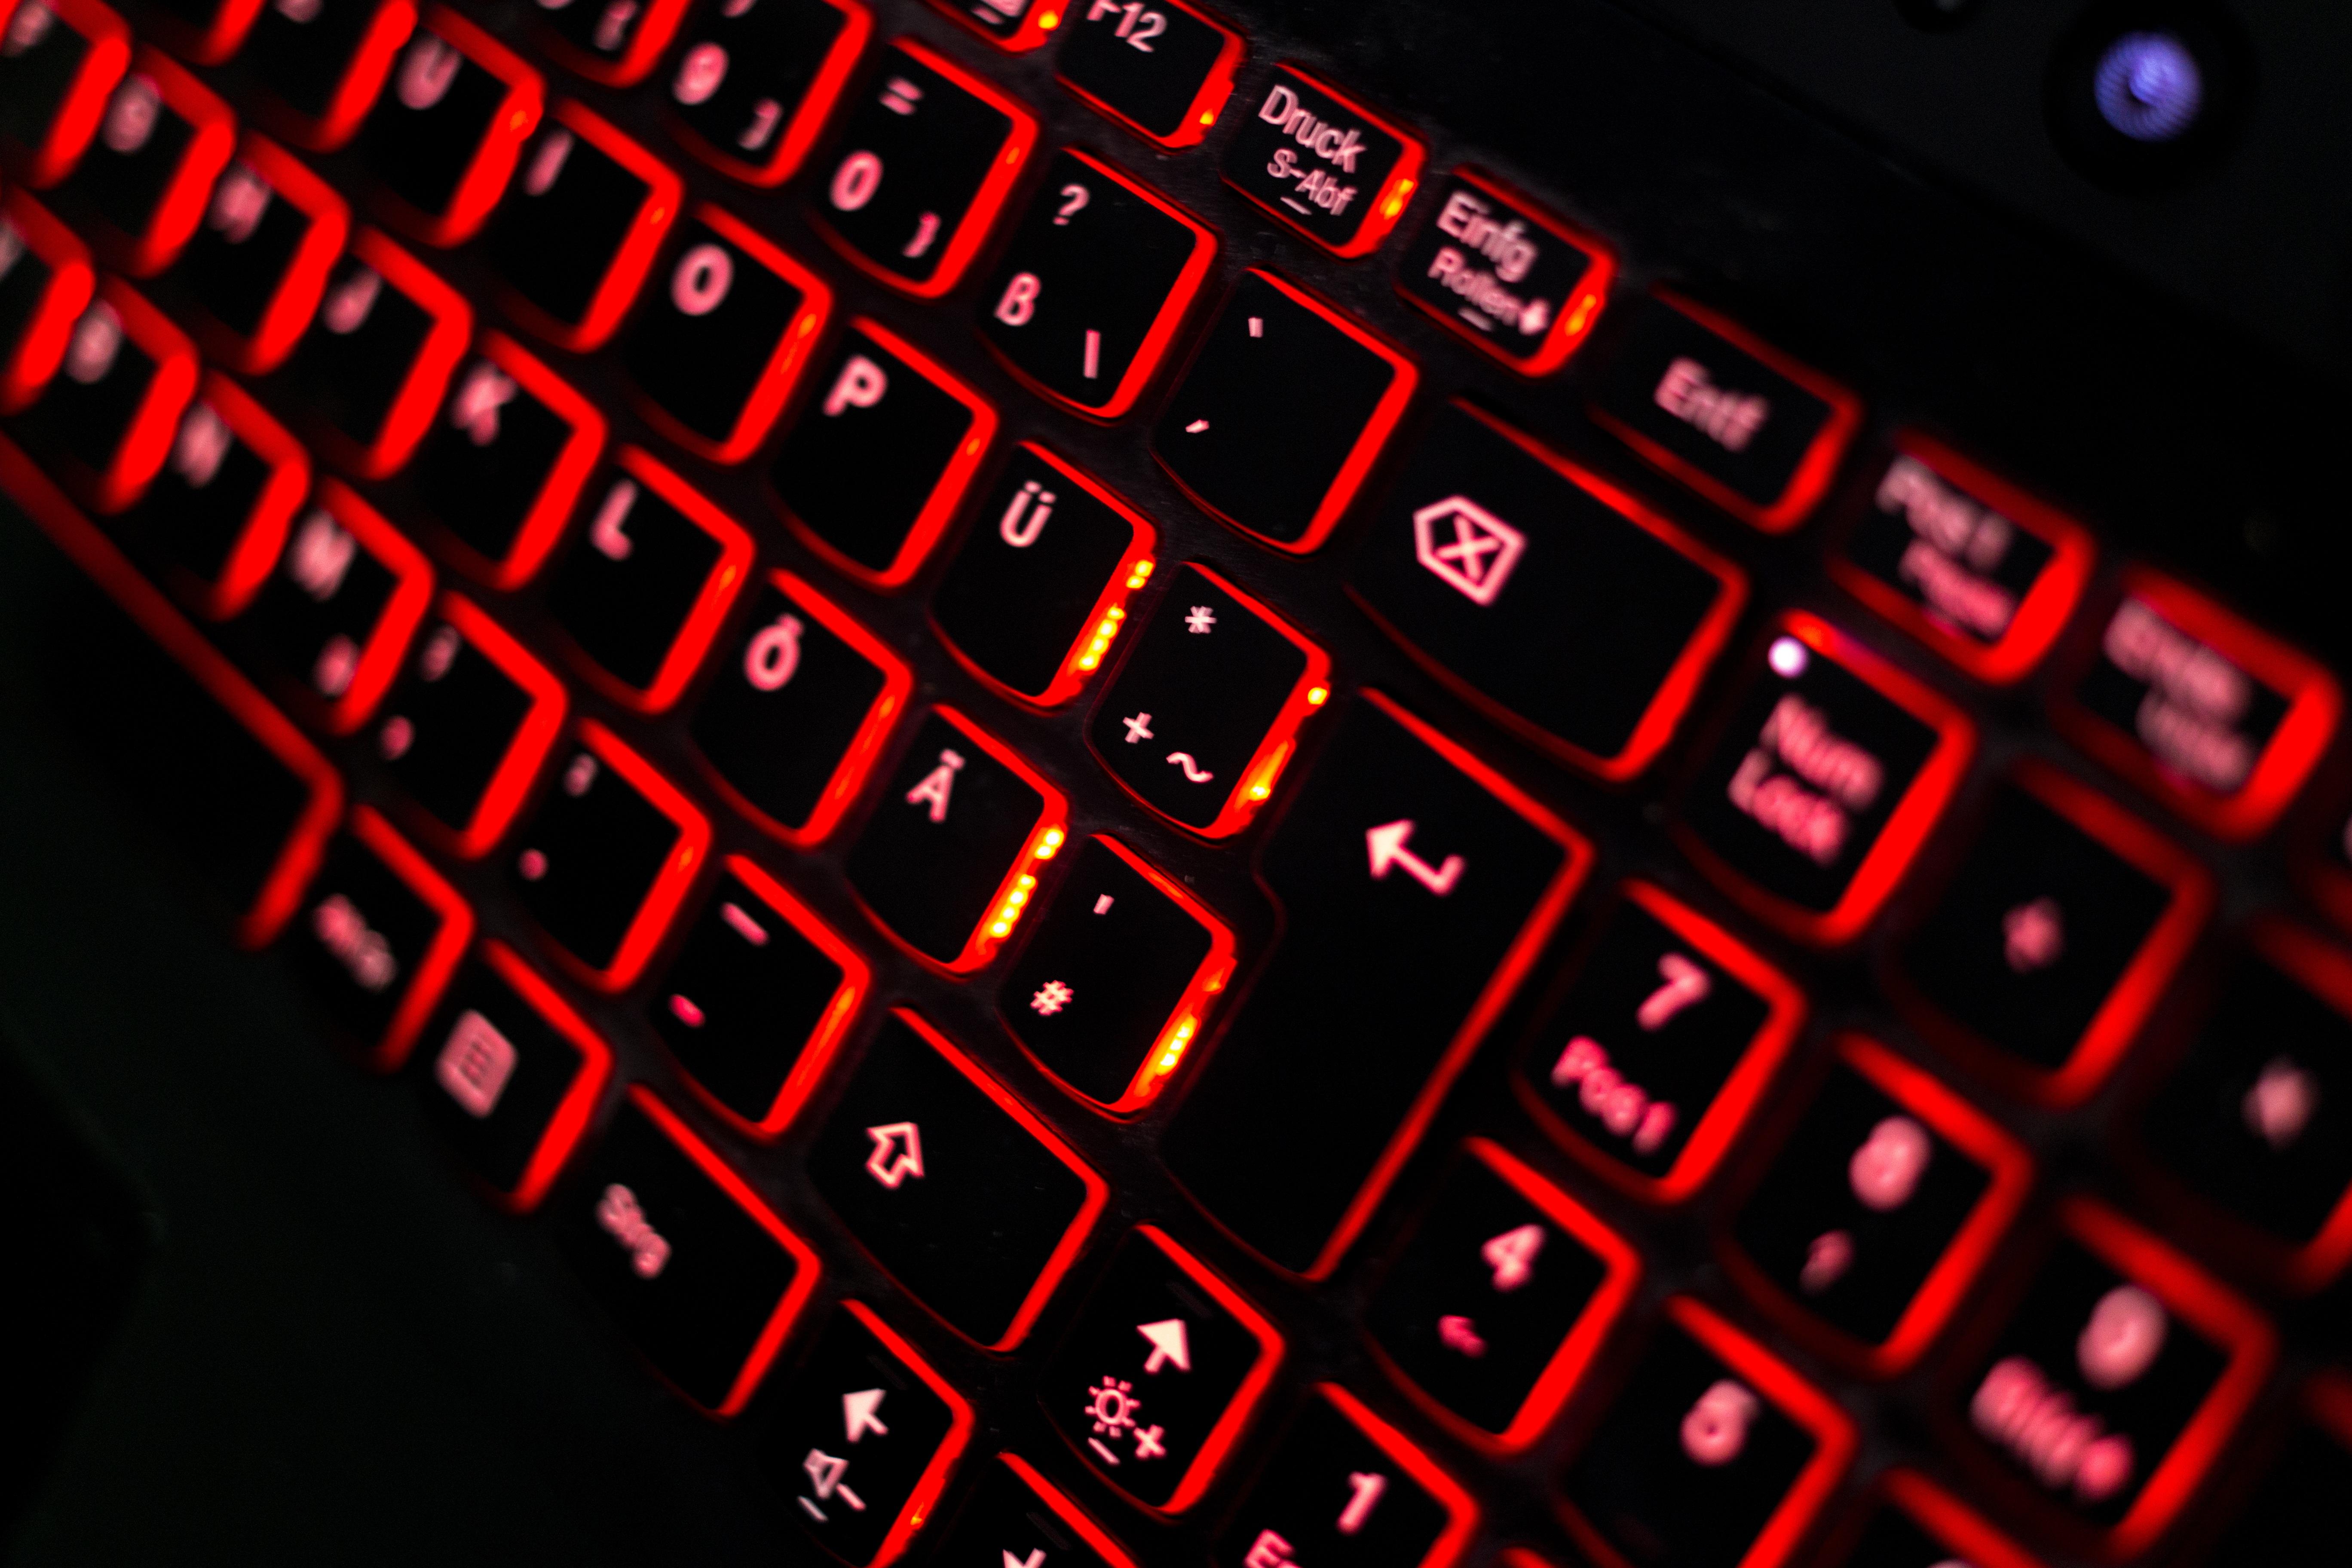 röd bärbar dator